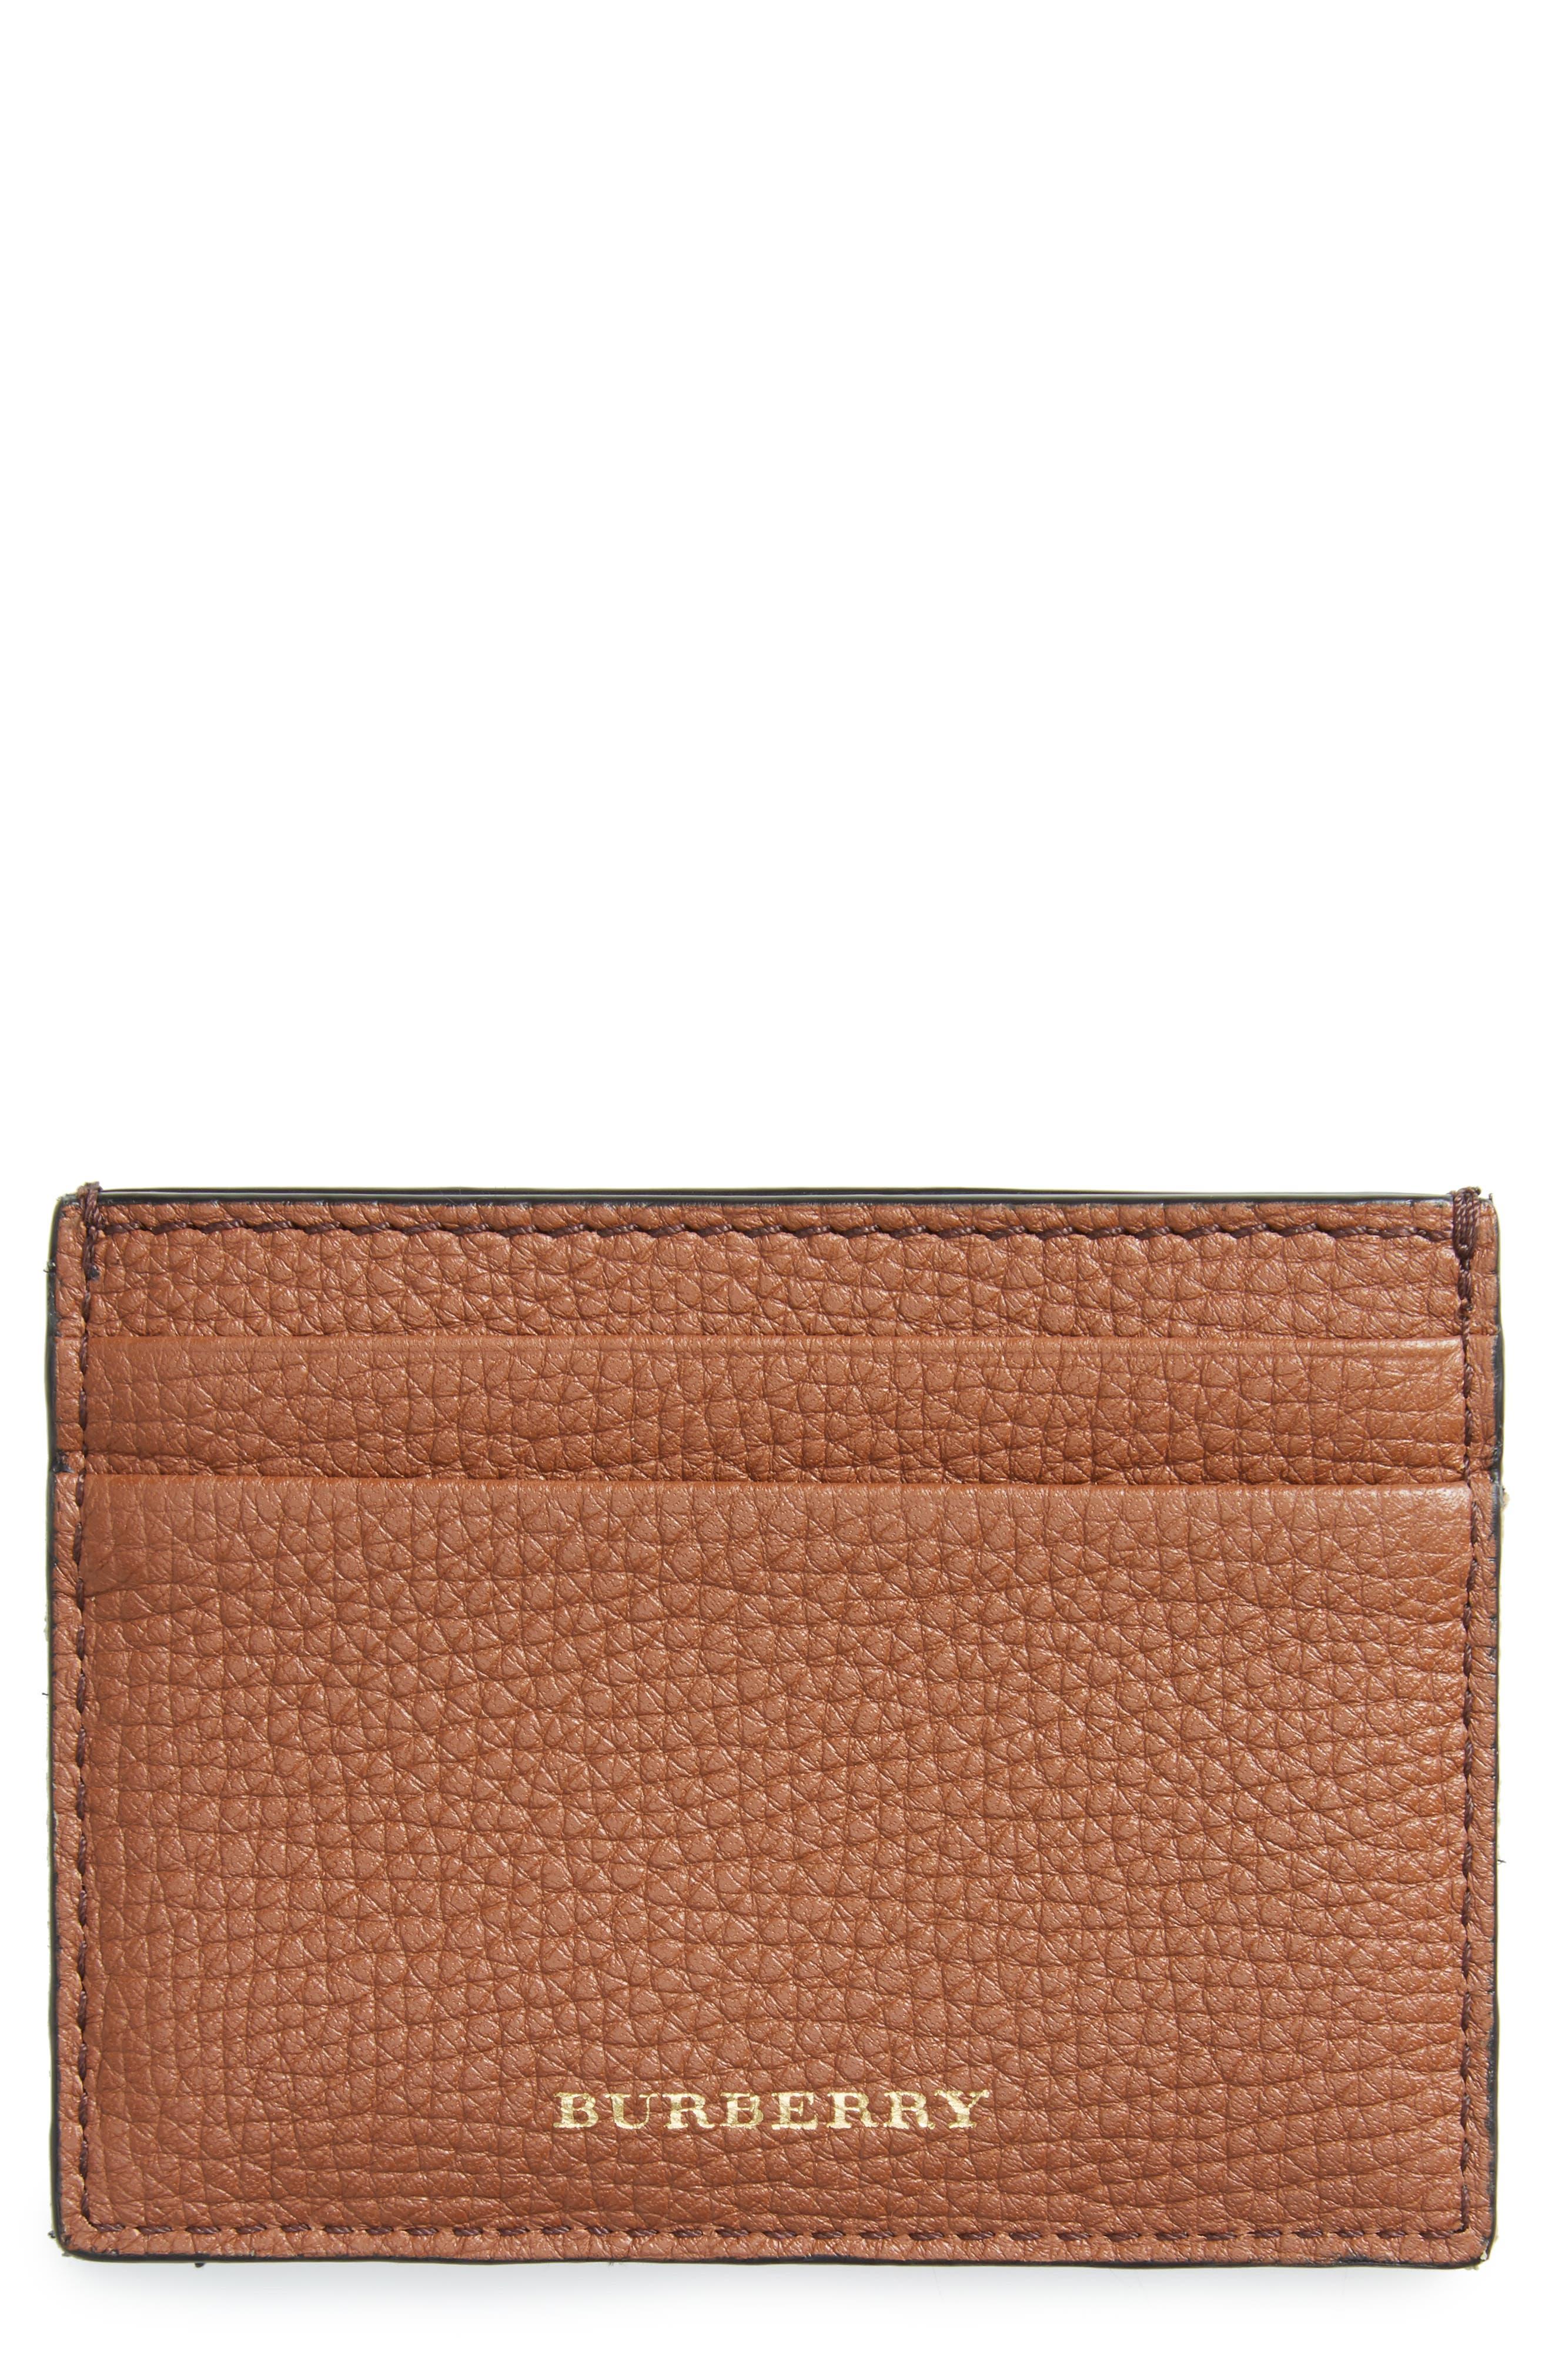 Main Image - Burberry Sandon Leather Card Case